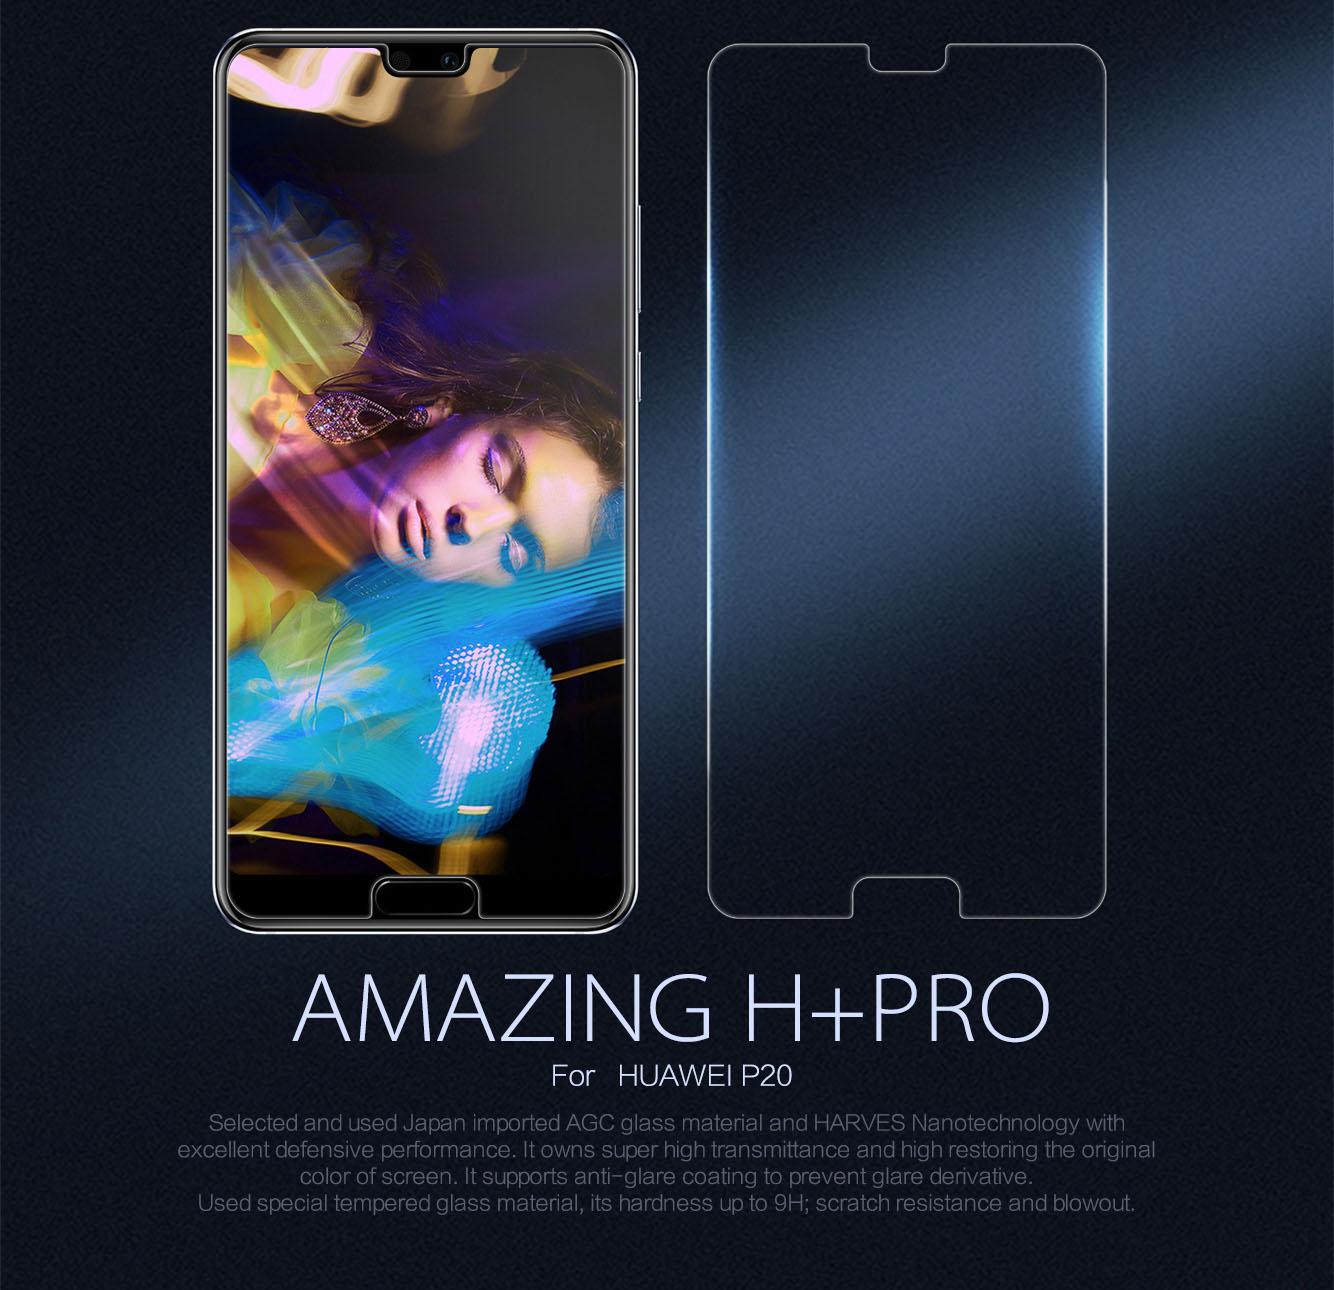 HUAWEI P20 screen protector